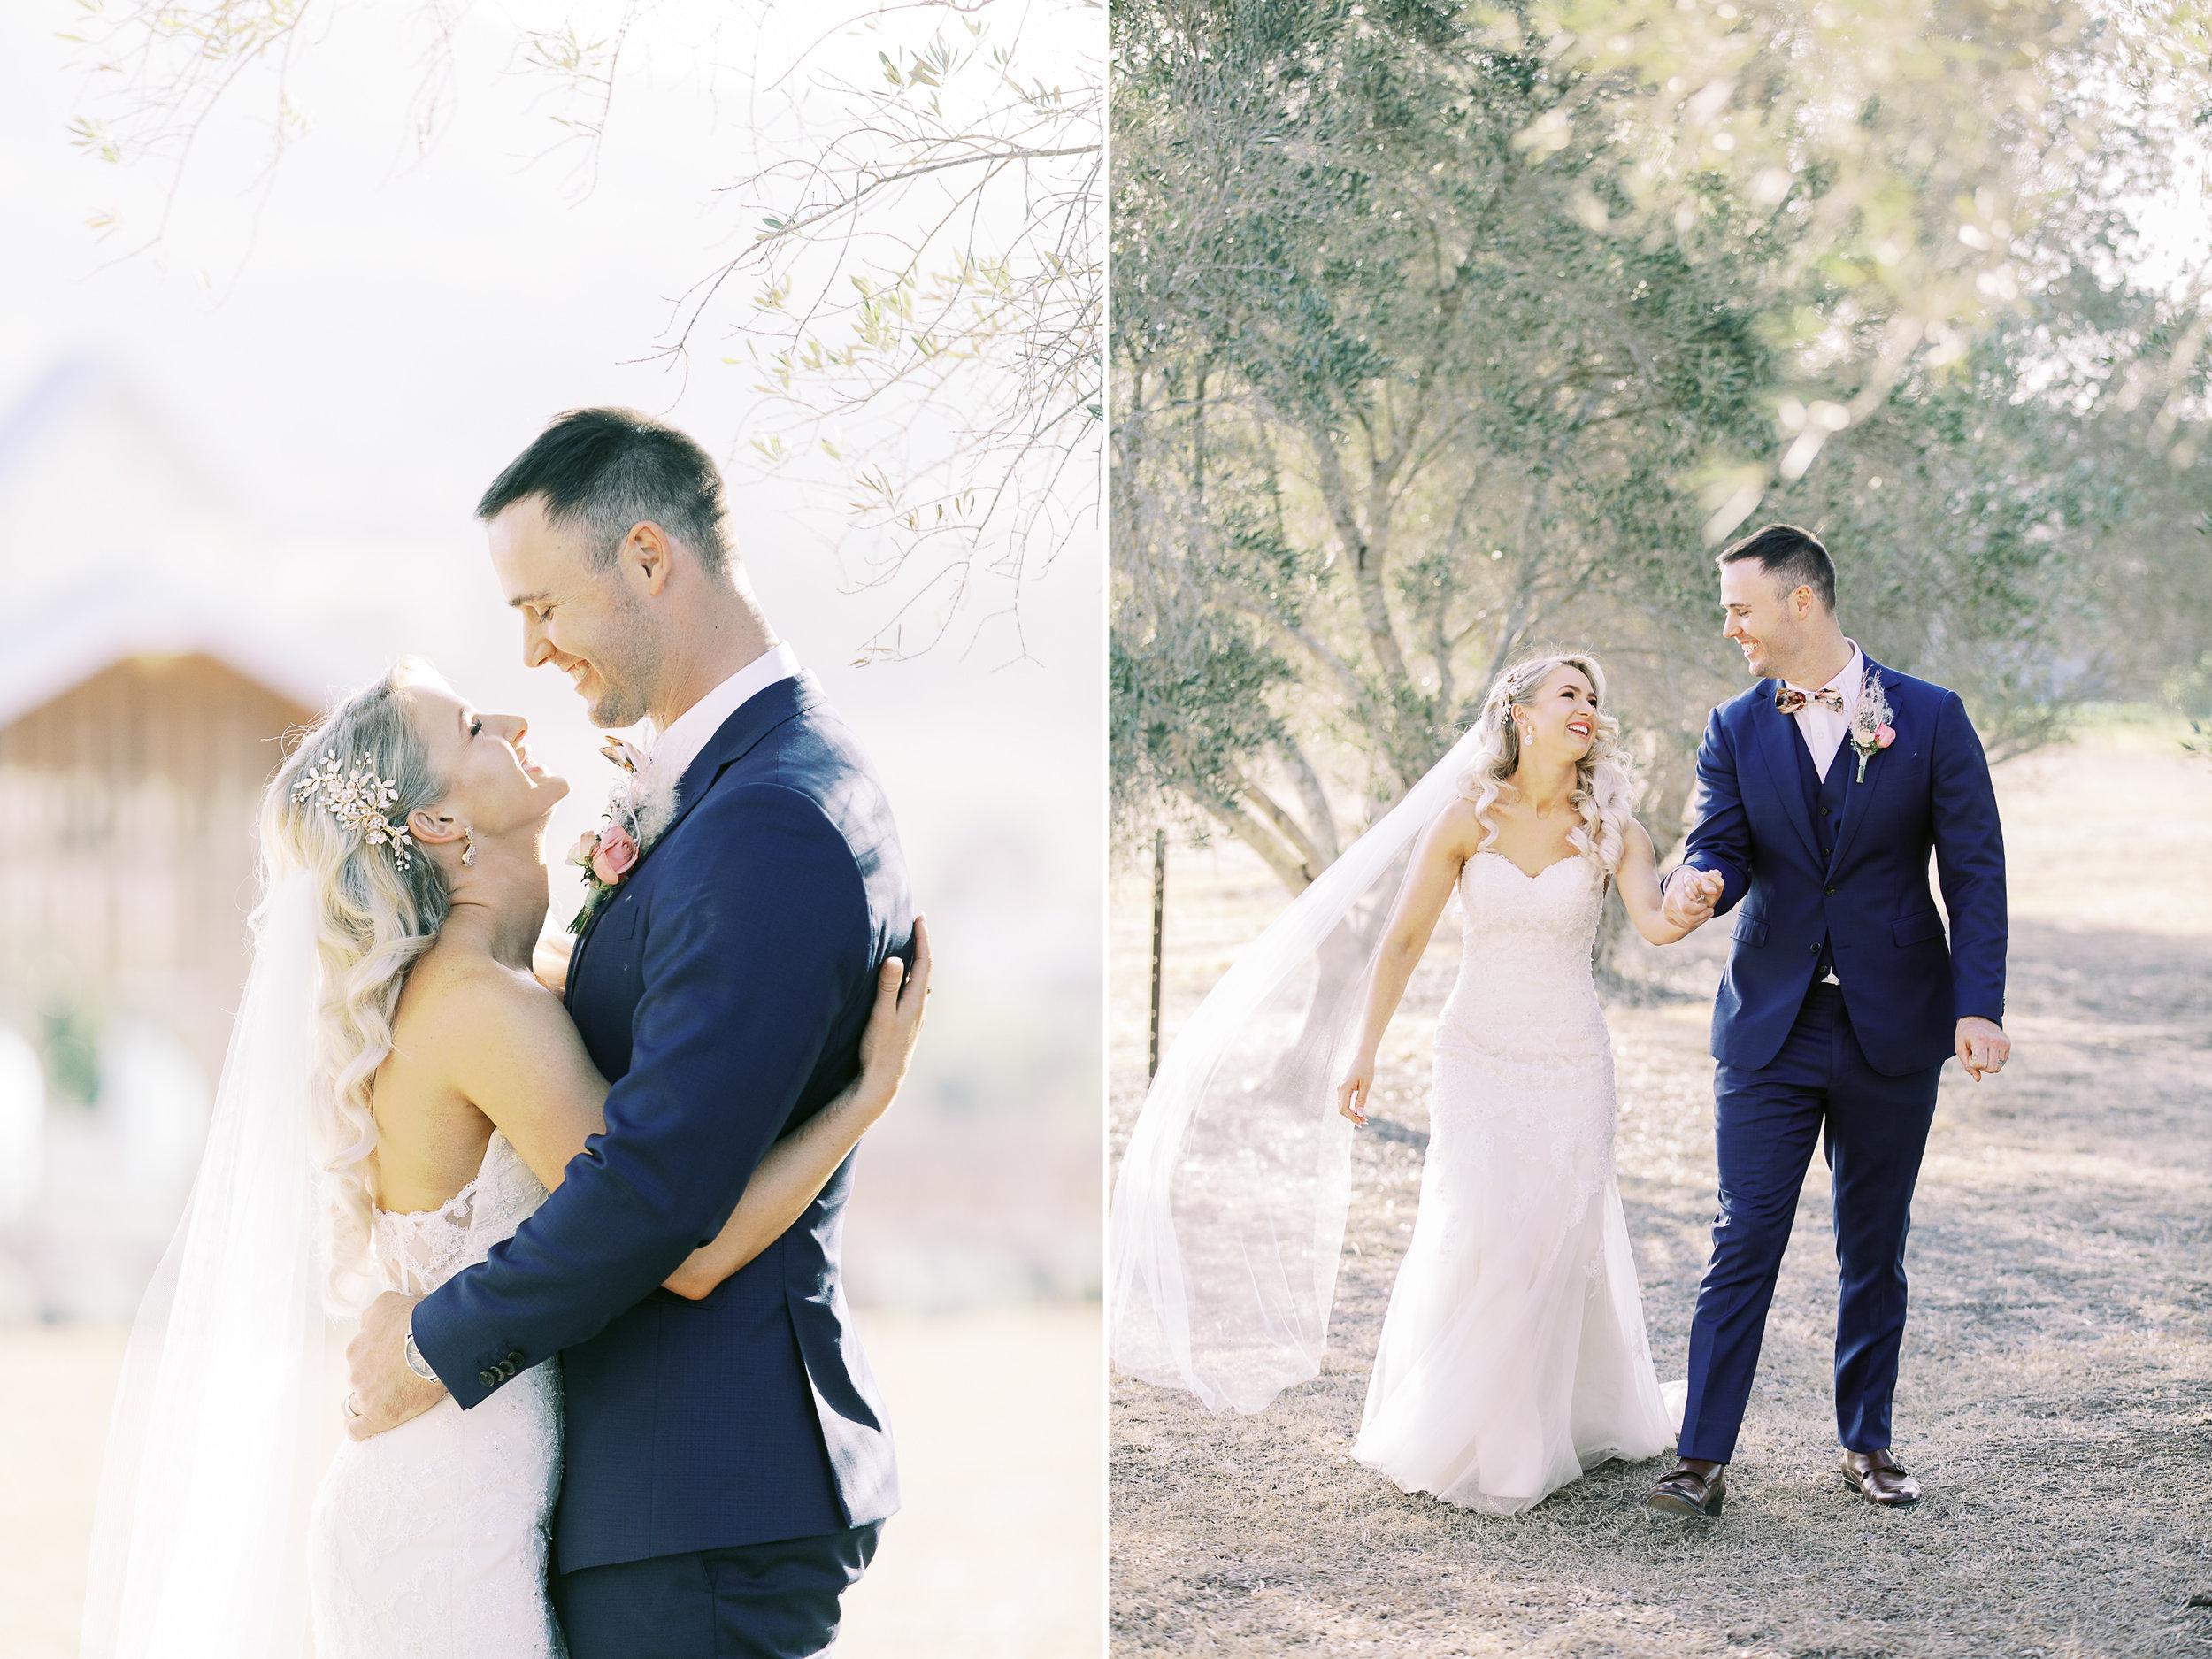 kooroomba-lavendar-farm-film-photography-wedding-photography-romantic-16.jpg